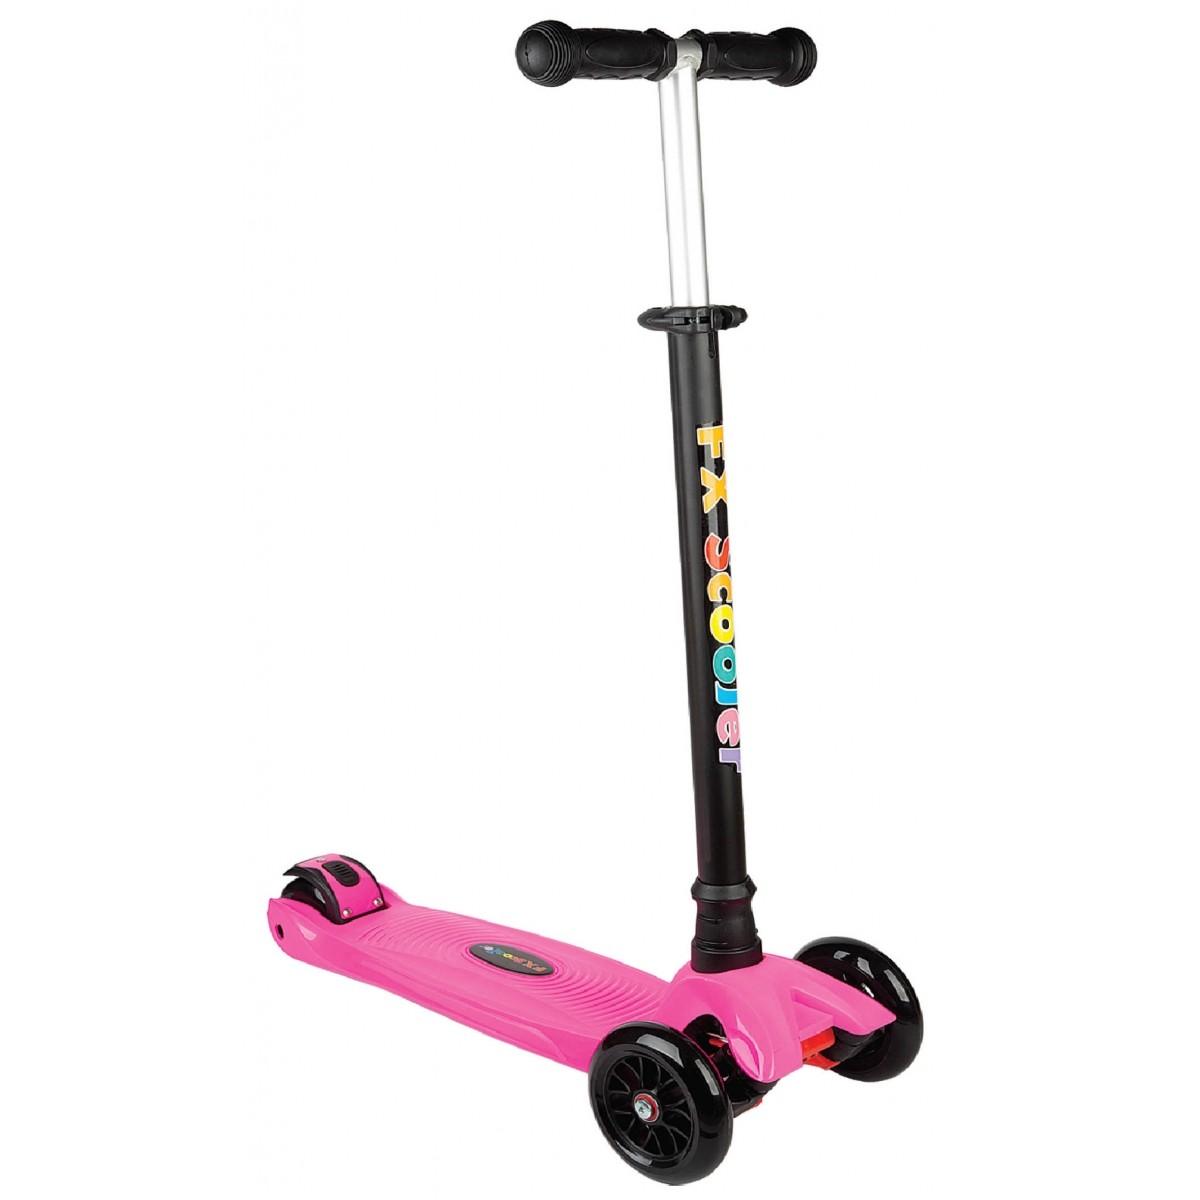 Patinete Scooter Radical Pink 3 Rodas - Fênix